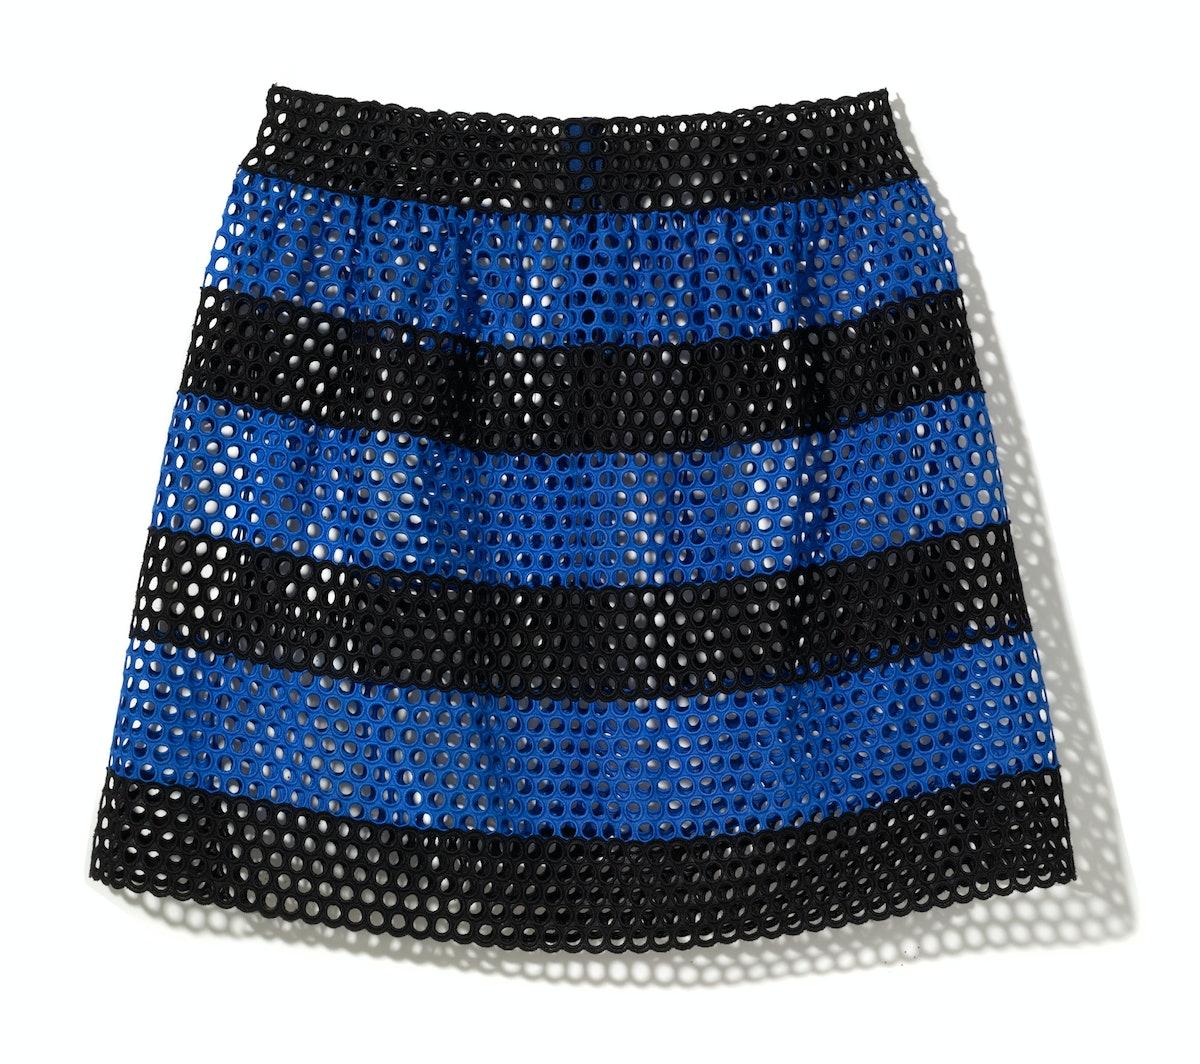 Marc Jacobs skirt, $1,200, marcjacobs.com.